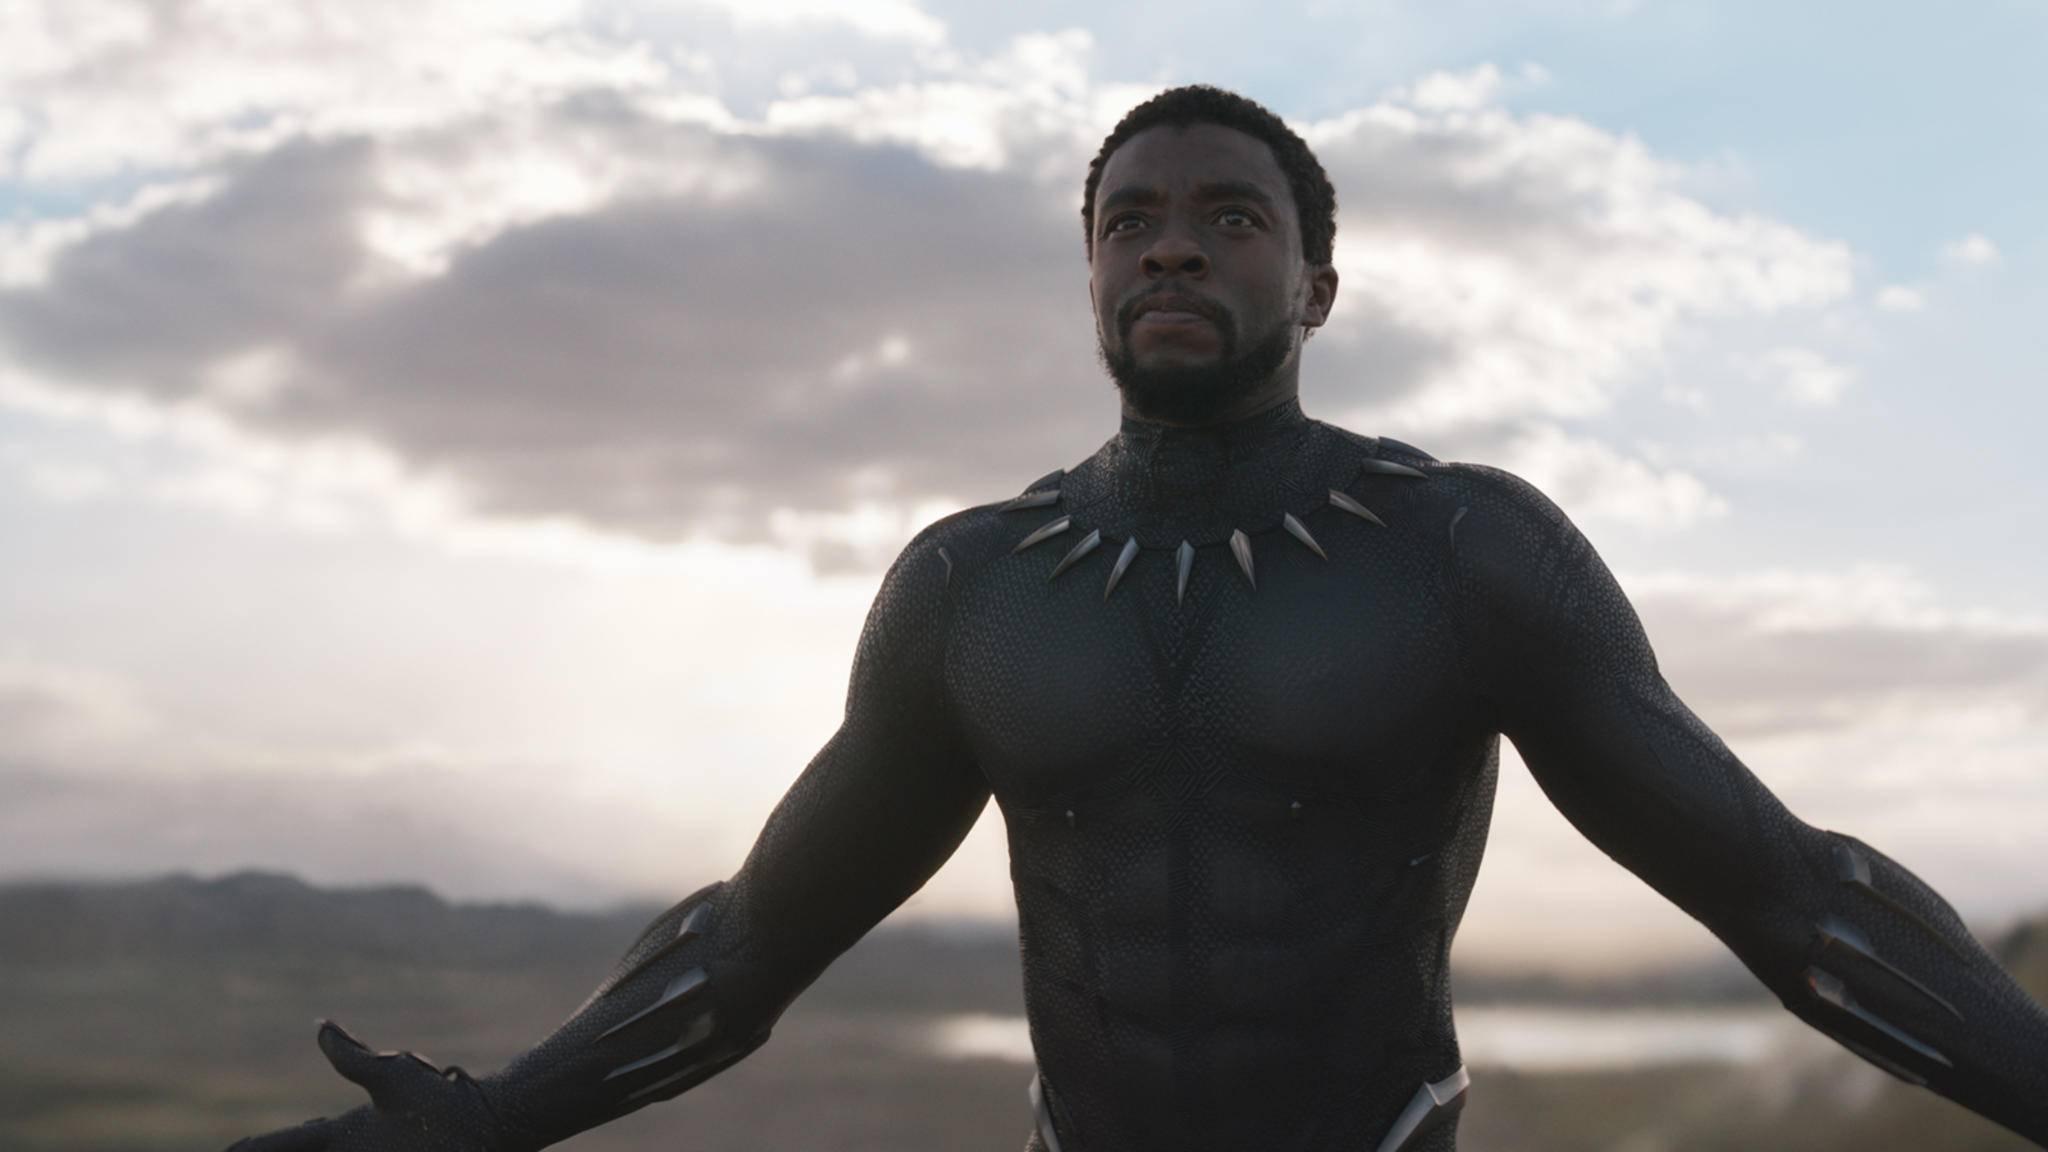 T'Challa alias Black Panther trinkt seinen Martini offenbar geschüttelt, nicht gerührt.